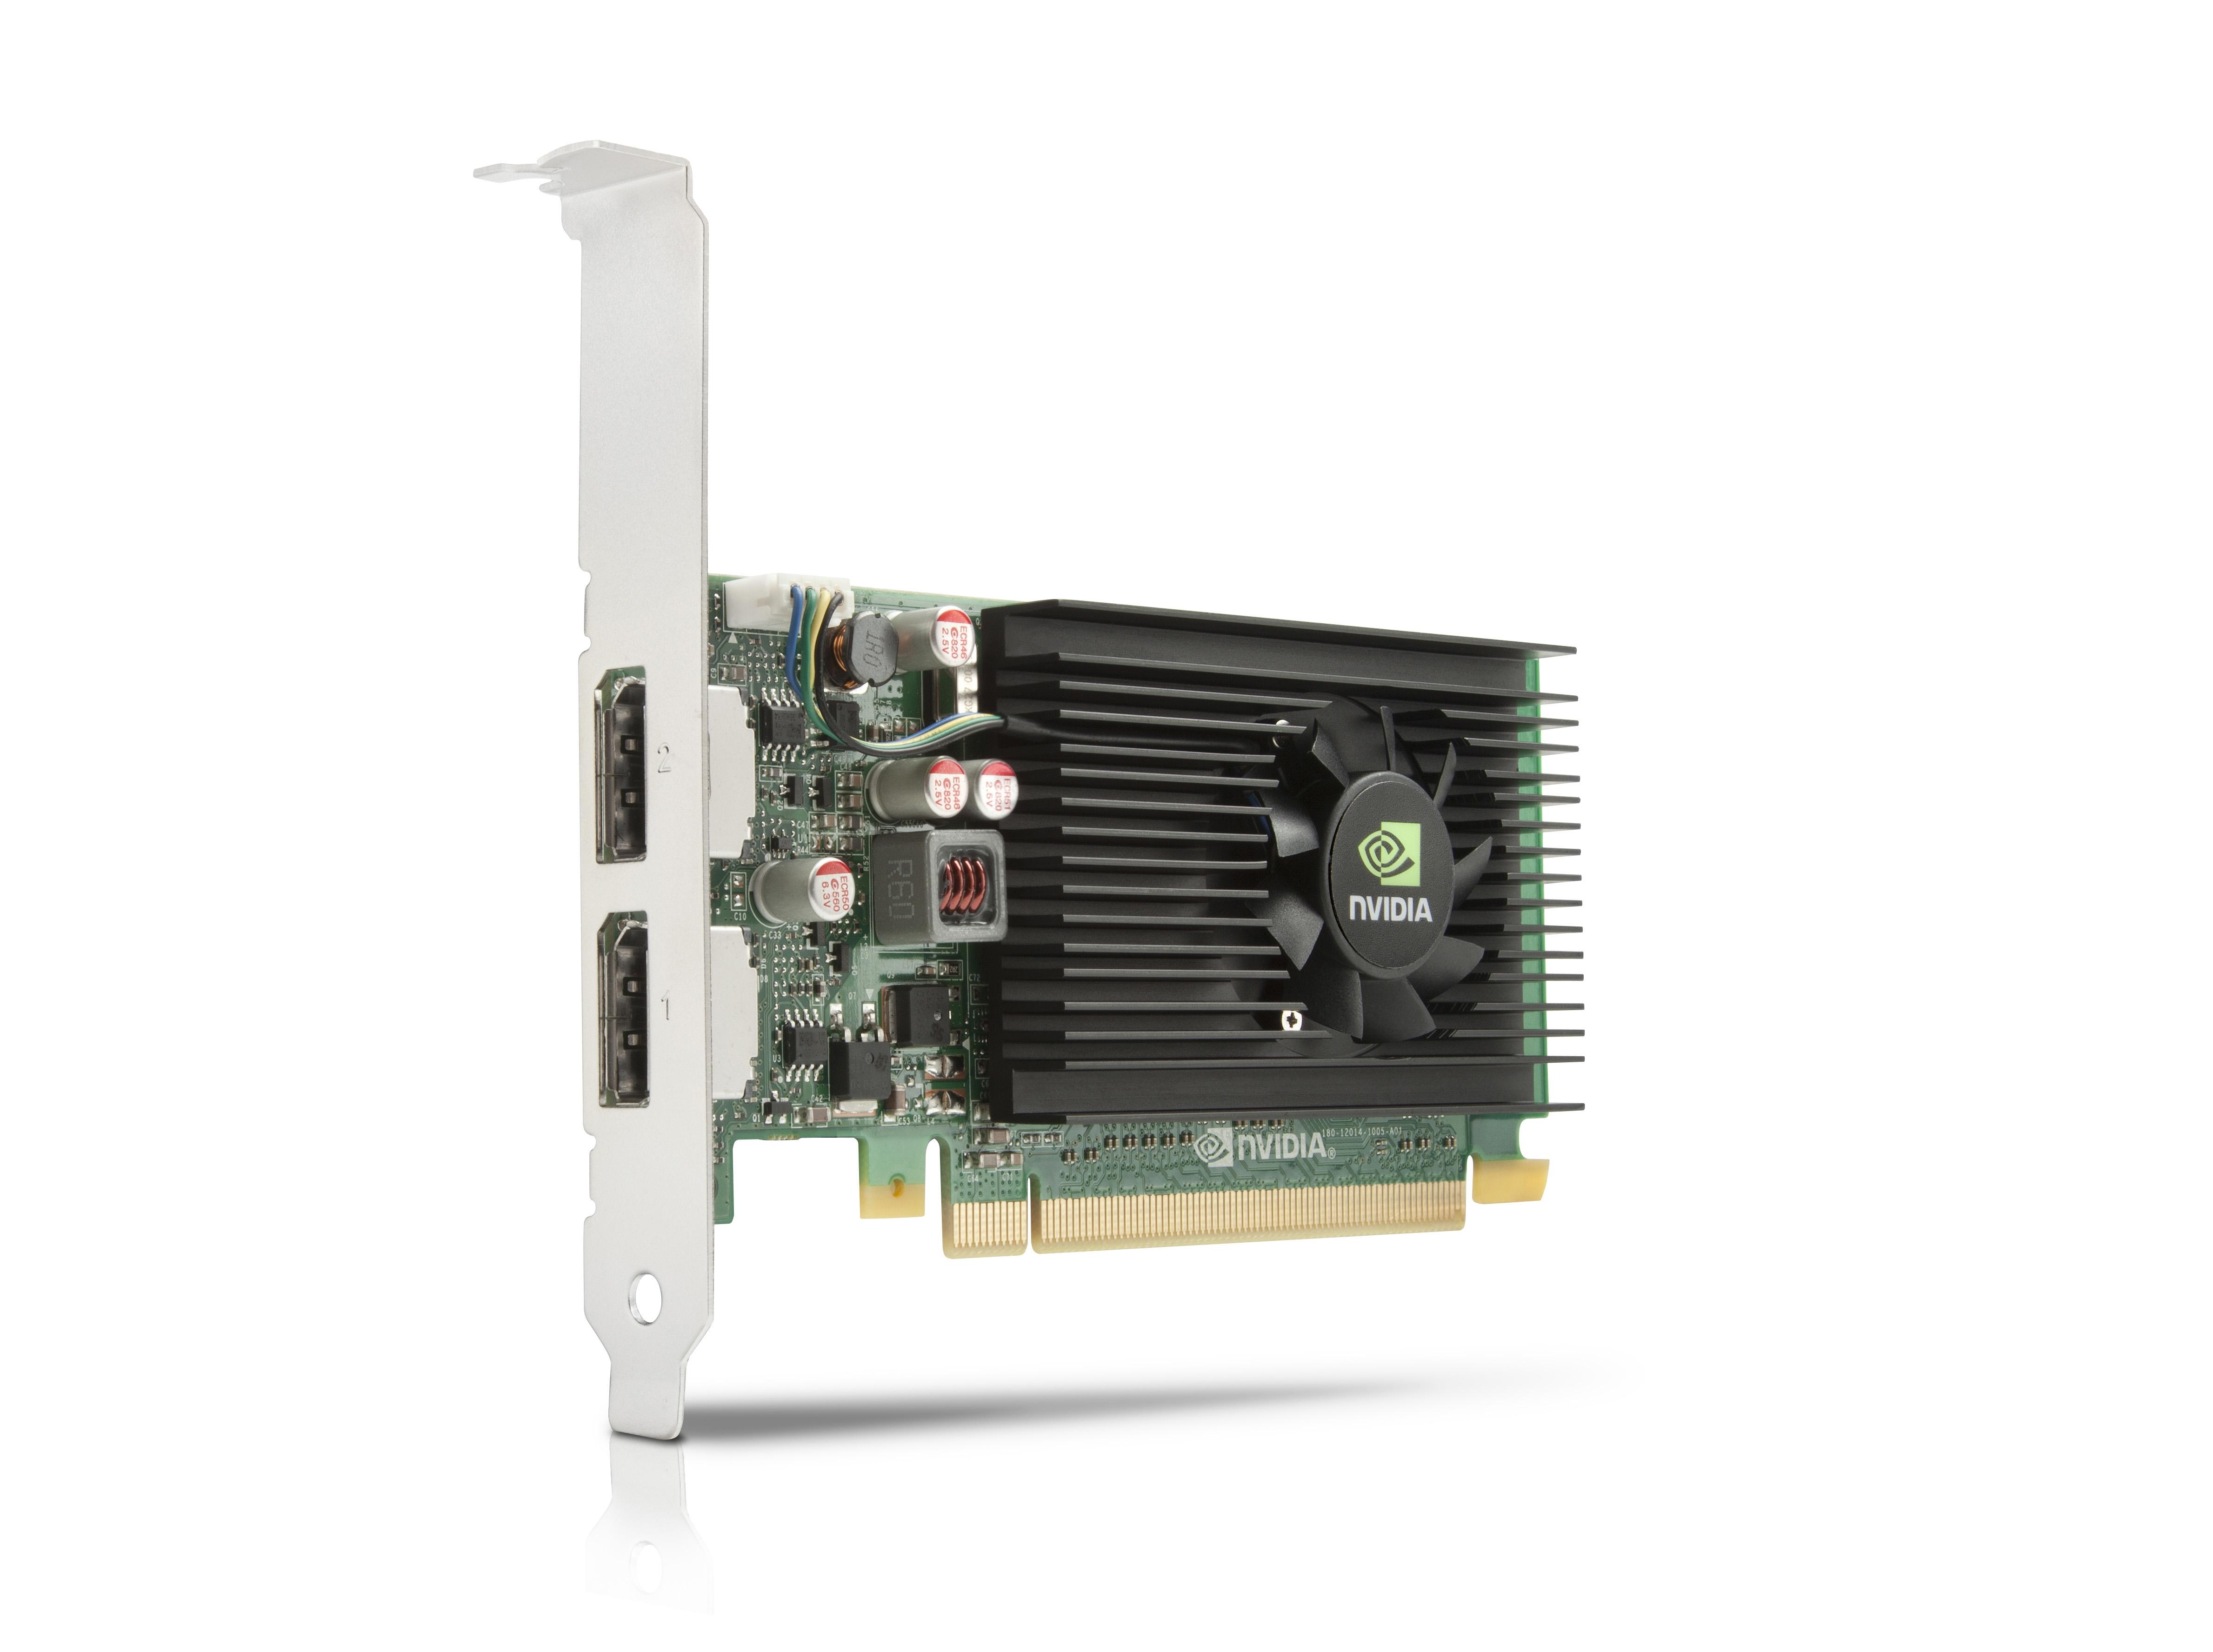 HP NVIDIA NVS 310 NVIDIA NVS 310 1GB